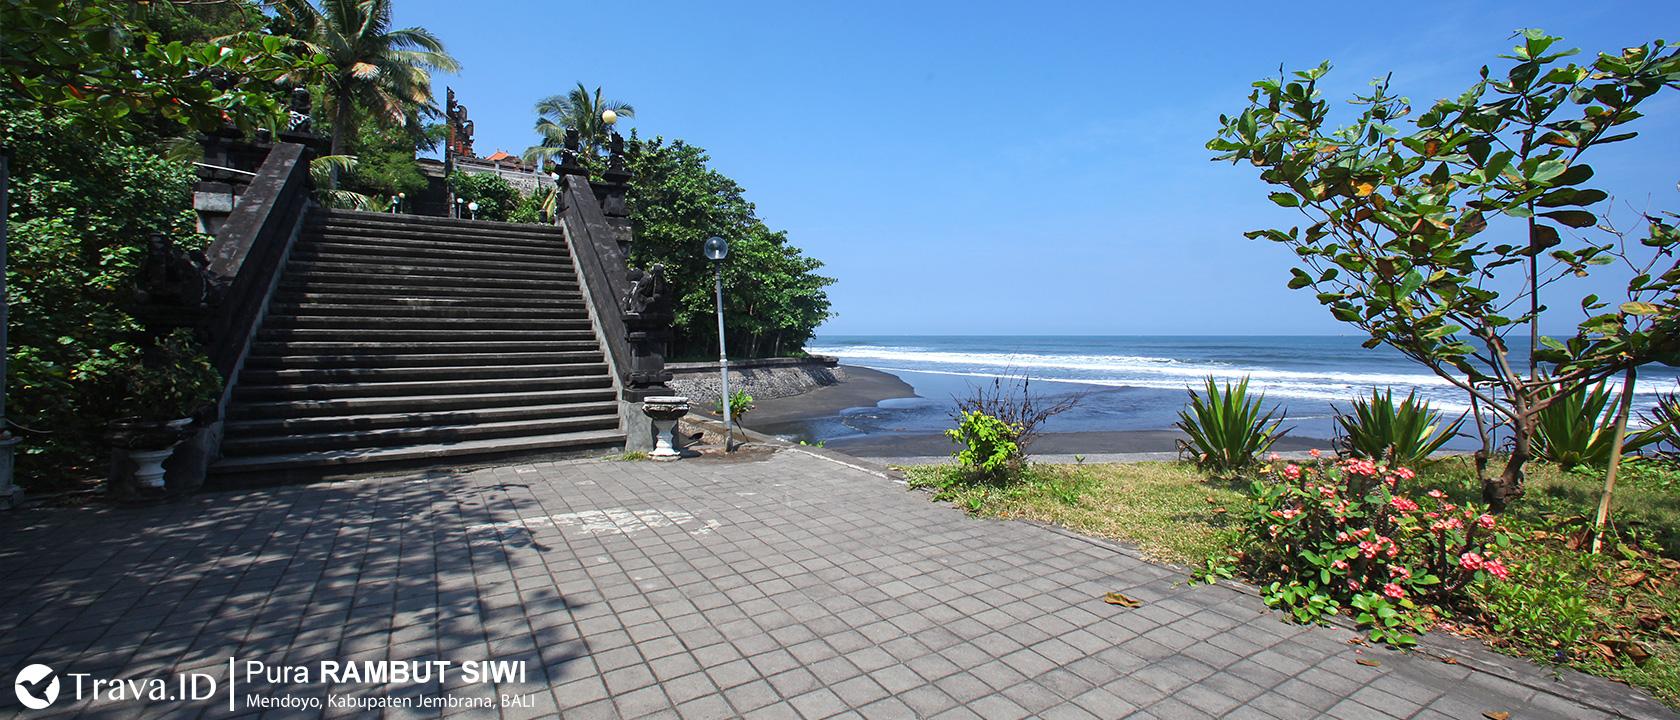 Pura Rambut Siwi Tempat Wisata Religi Bali Trava Id Kota